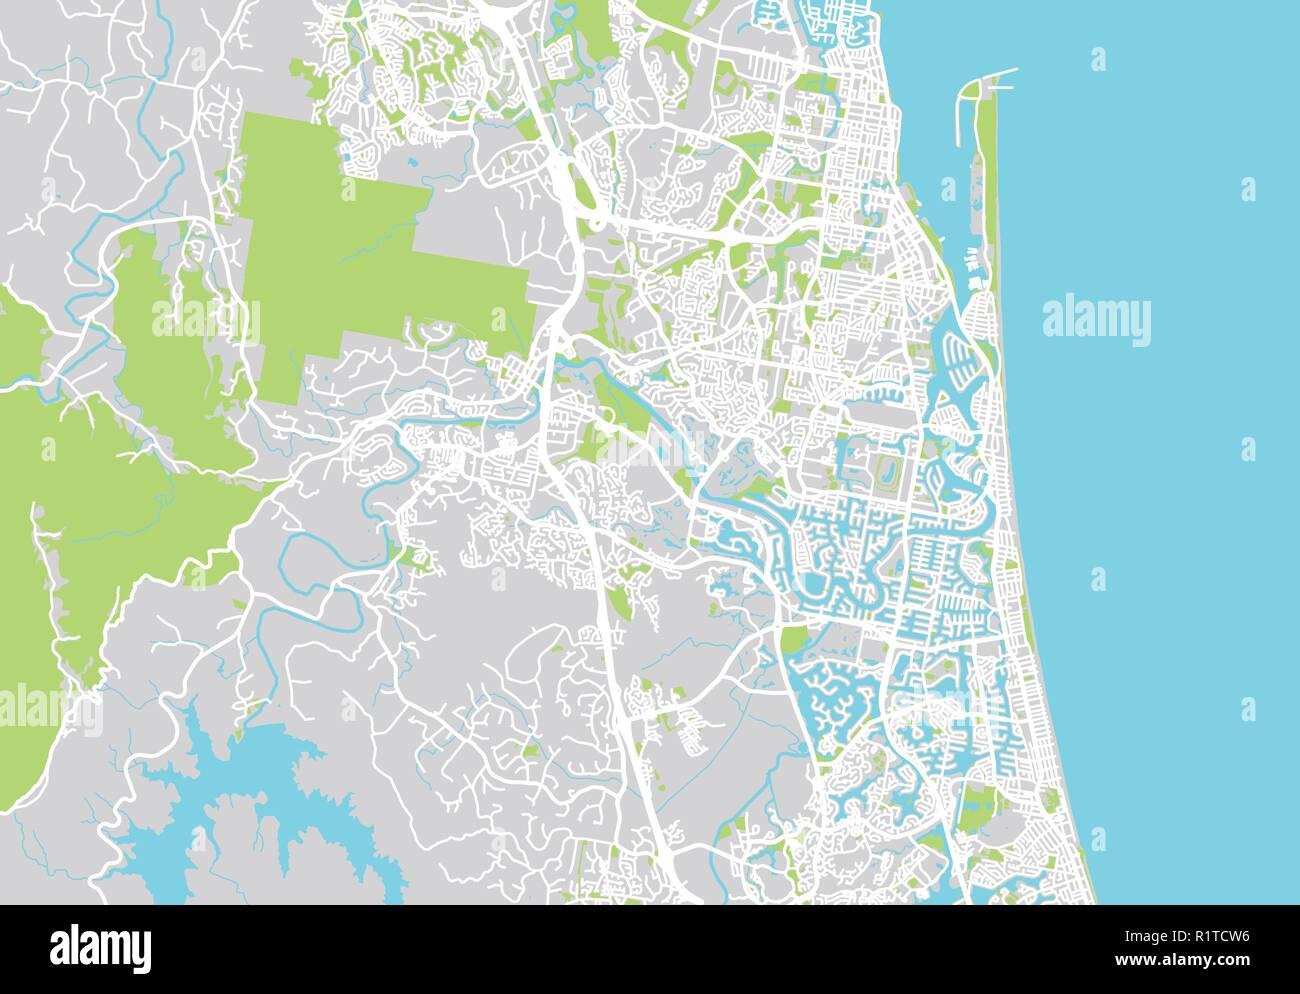 Urban vector city map of Gold Coast, Australia Stock Vector ... on map of australia oceania, map of australia auckland, map of australia queensland, map of australia albany, map of australia adelaide, map of australia new zealand, map of australia melbourne, map of australia great dividing range, map of australia sydney, map of australia hobart, map of australia new south wales, map of australia christmas island, map of australia perth, map of australia canberra, map of australia australian capital territory, map of australia byron bay, map of australia great barrier reef, map of australia kuala lumpur, map of australia brisbane, map of australia murray river,